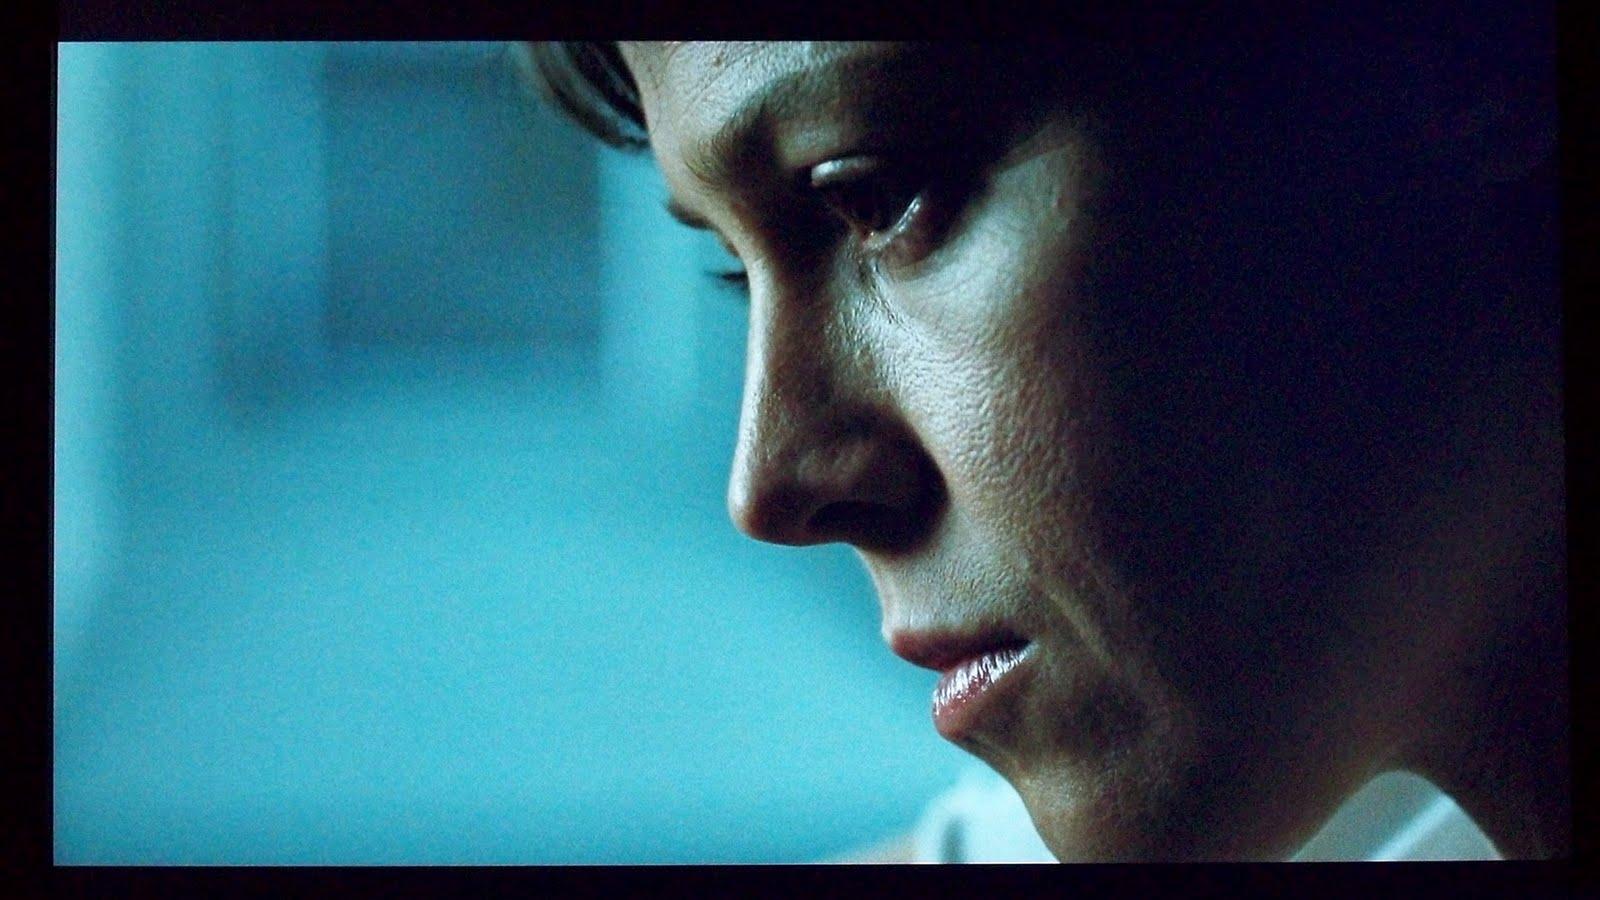 http://2.bp.blogspot.com/-W5Ob1RJ6njY/TcjYfqx5CaI/AAAAAAAAAE8/nmW6oLXAoPY/s1600/Aliens_Ripley_Cam.jpg